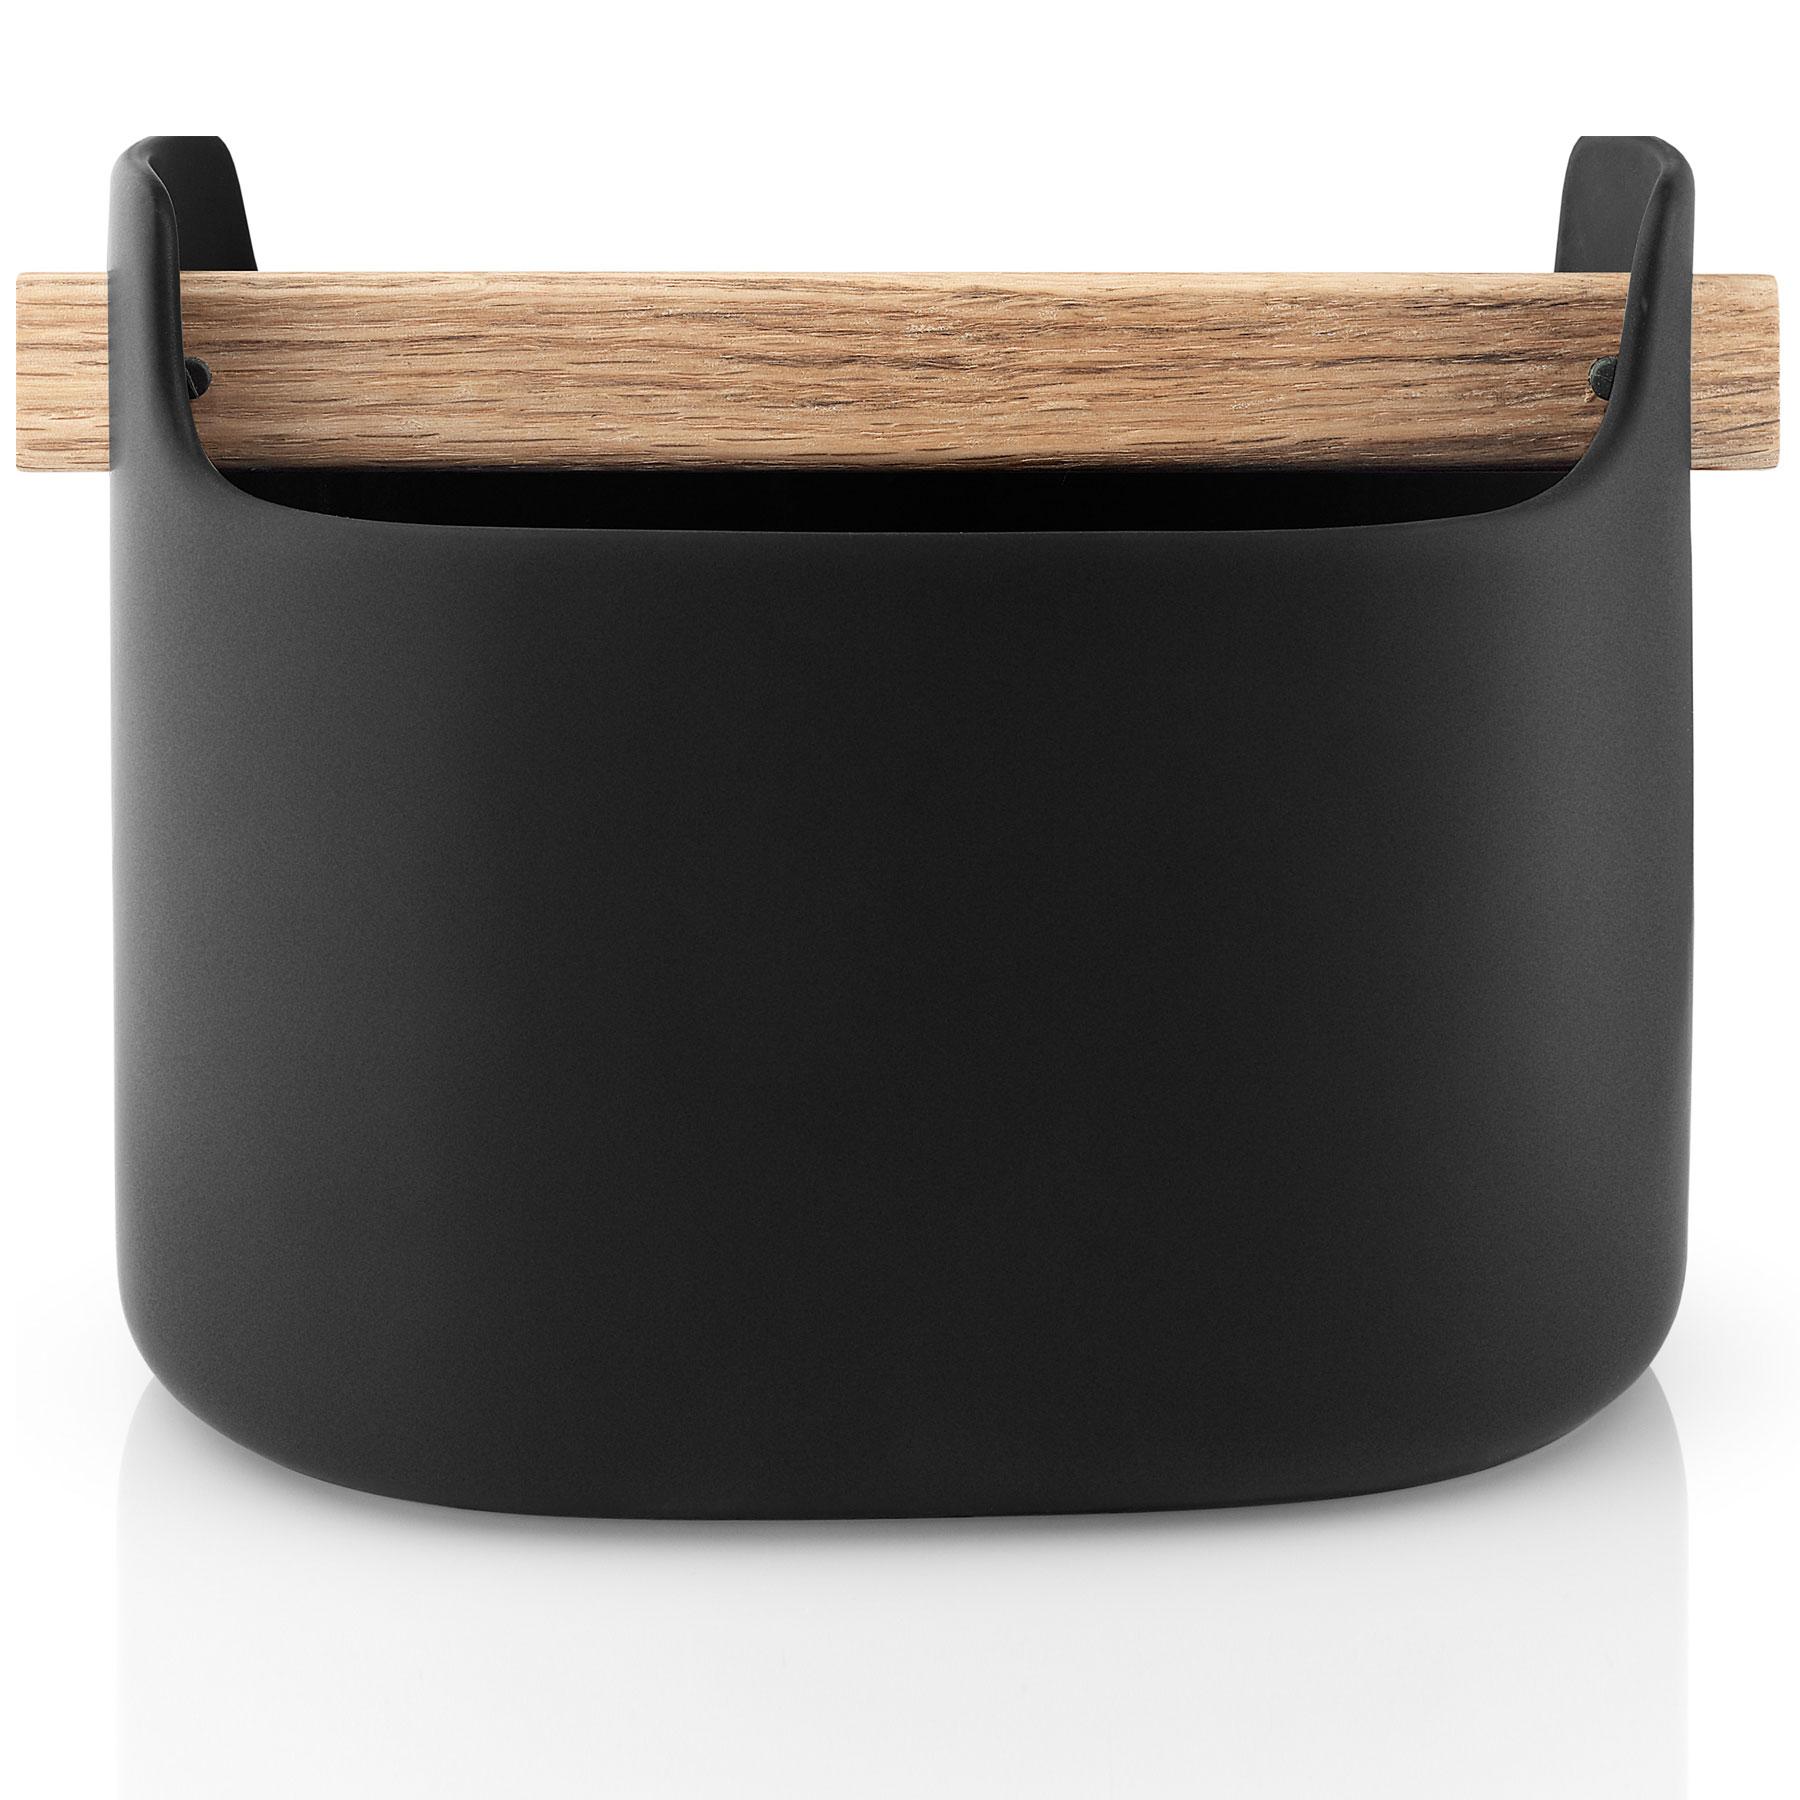 Full Size of Aufbewahrungsbehälter Eva Solo Toolboaufbewahrungsbehlter Niedrig 15 Cm Keramik Küche Wohnzimmer Aufbewahrungsbehälter